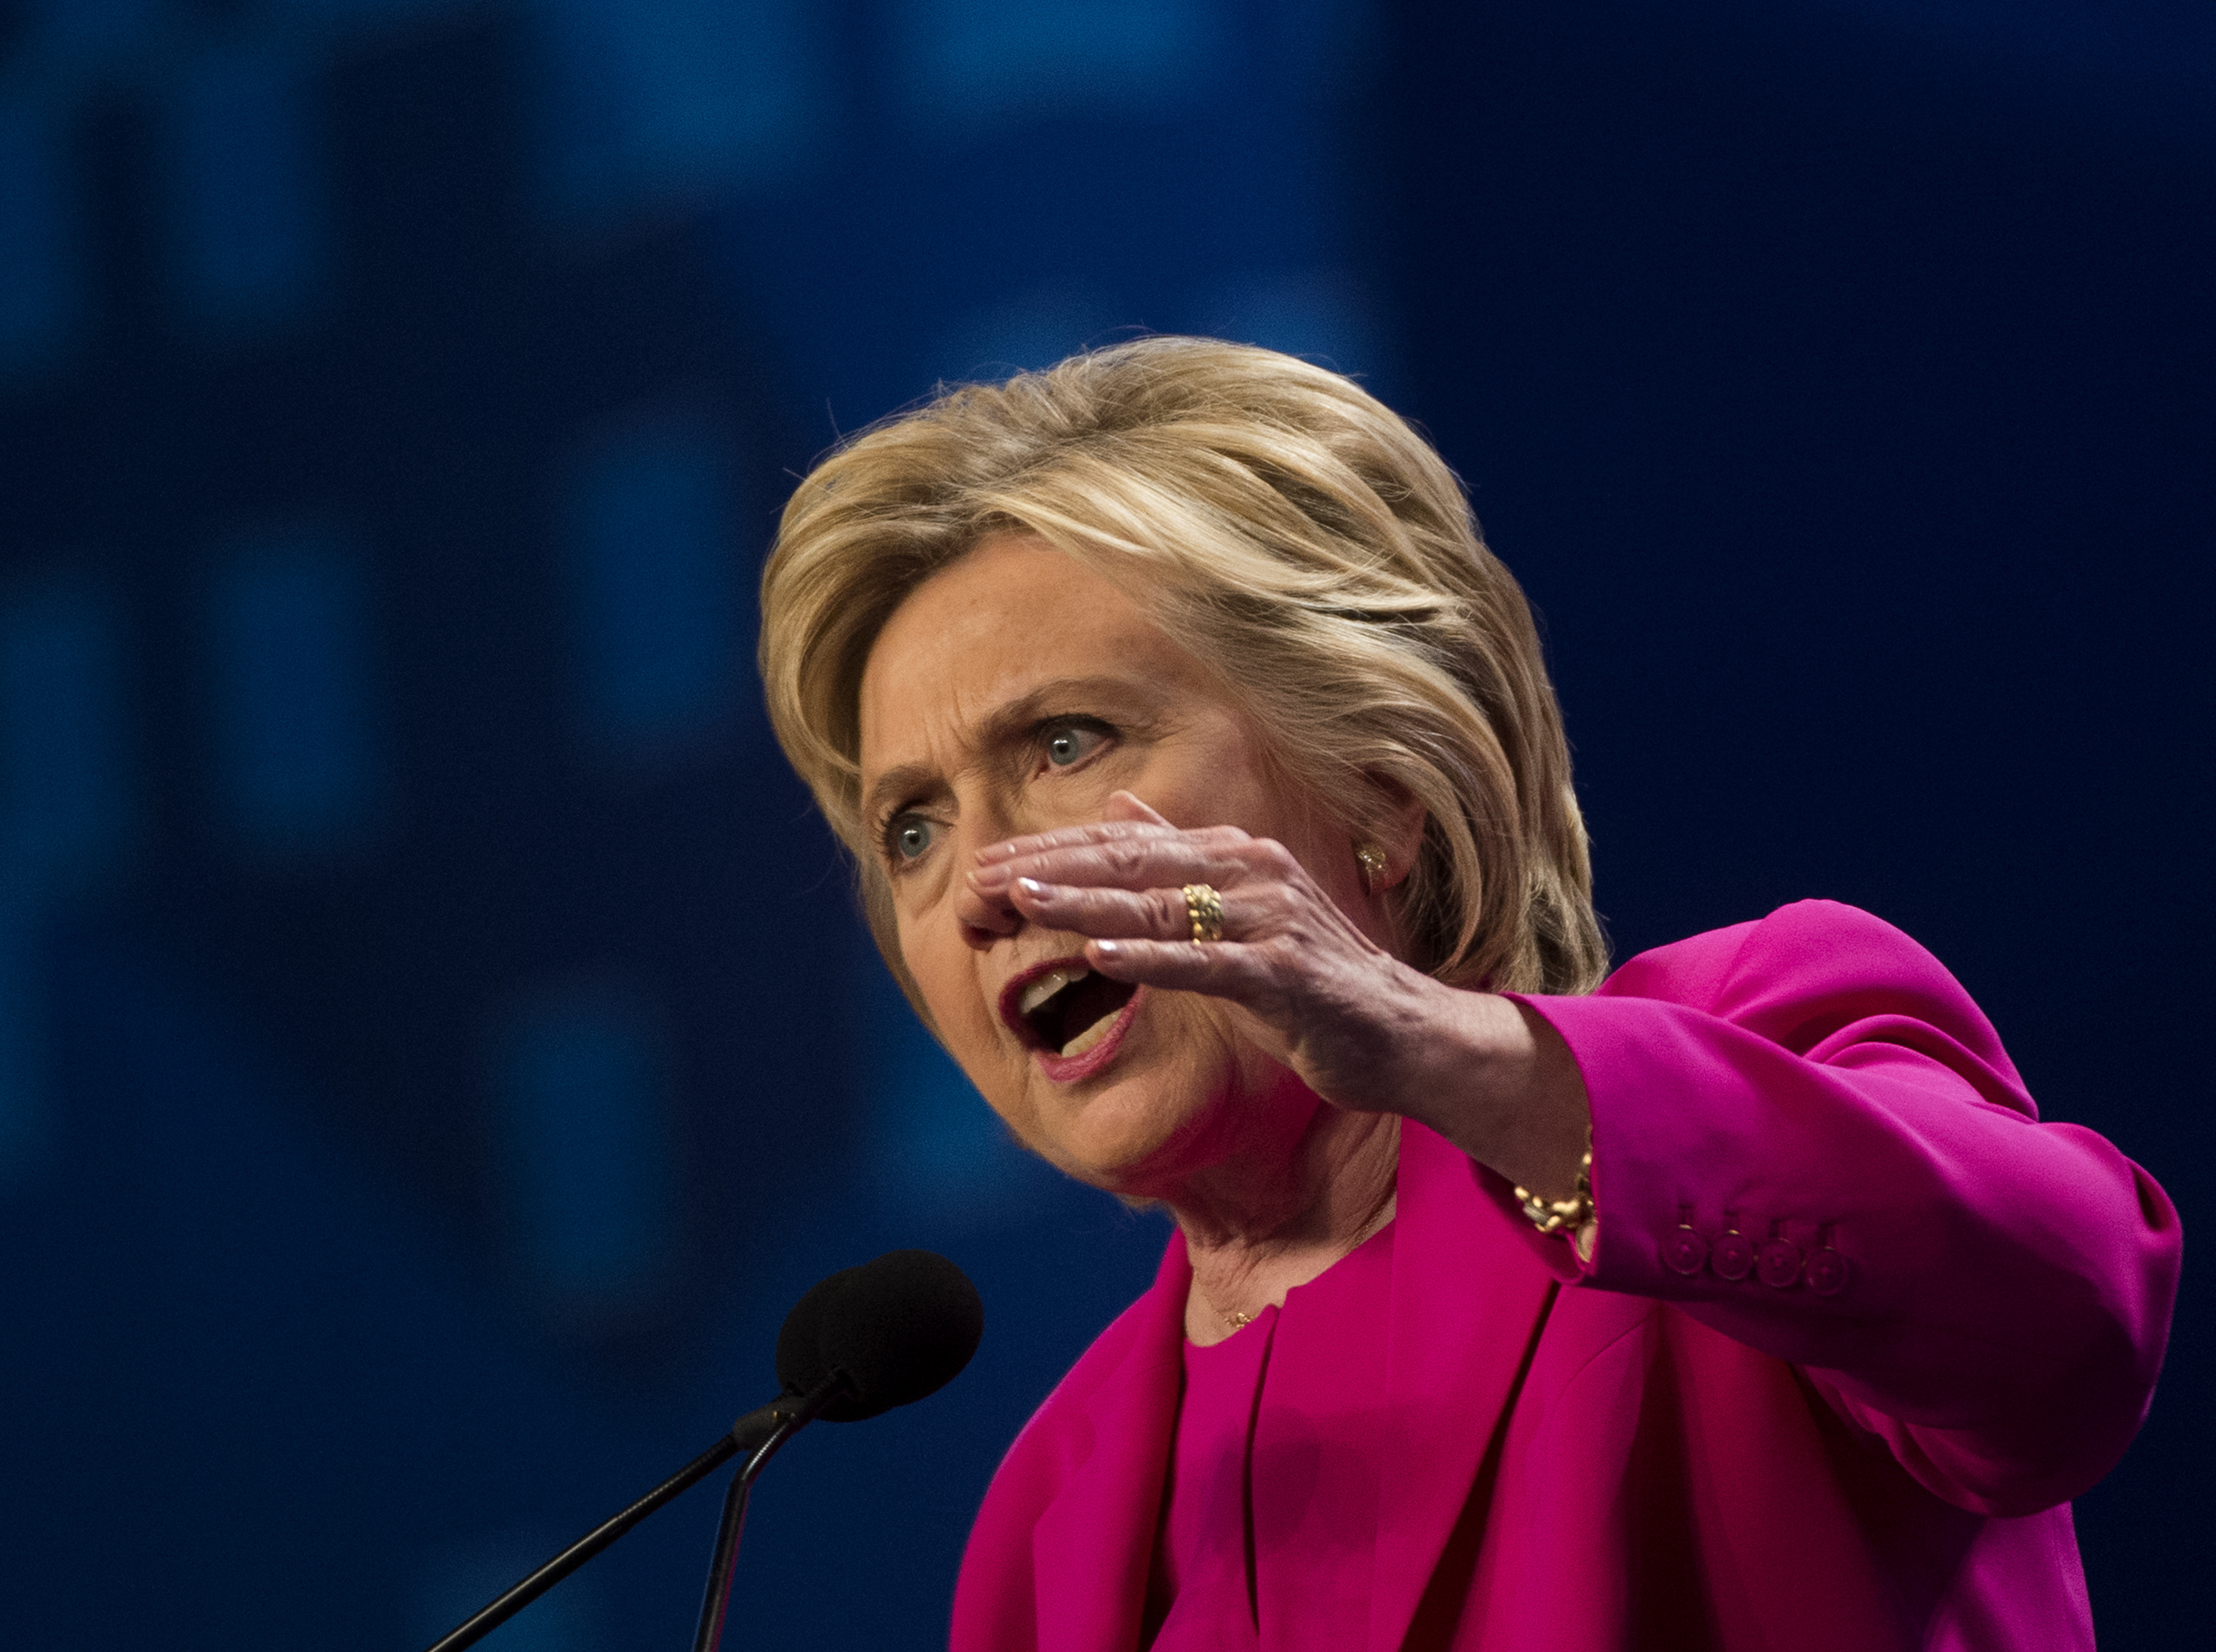 DEM 2016 Clinton Emails